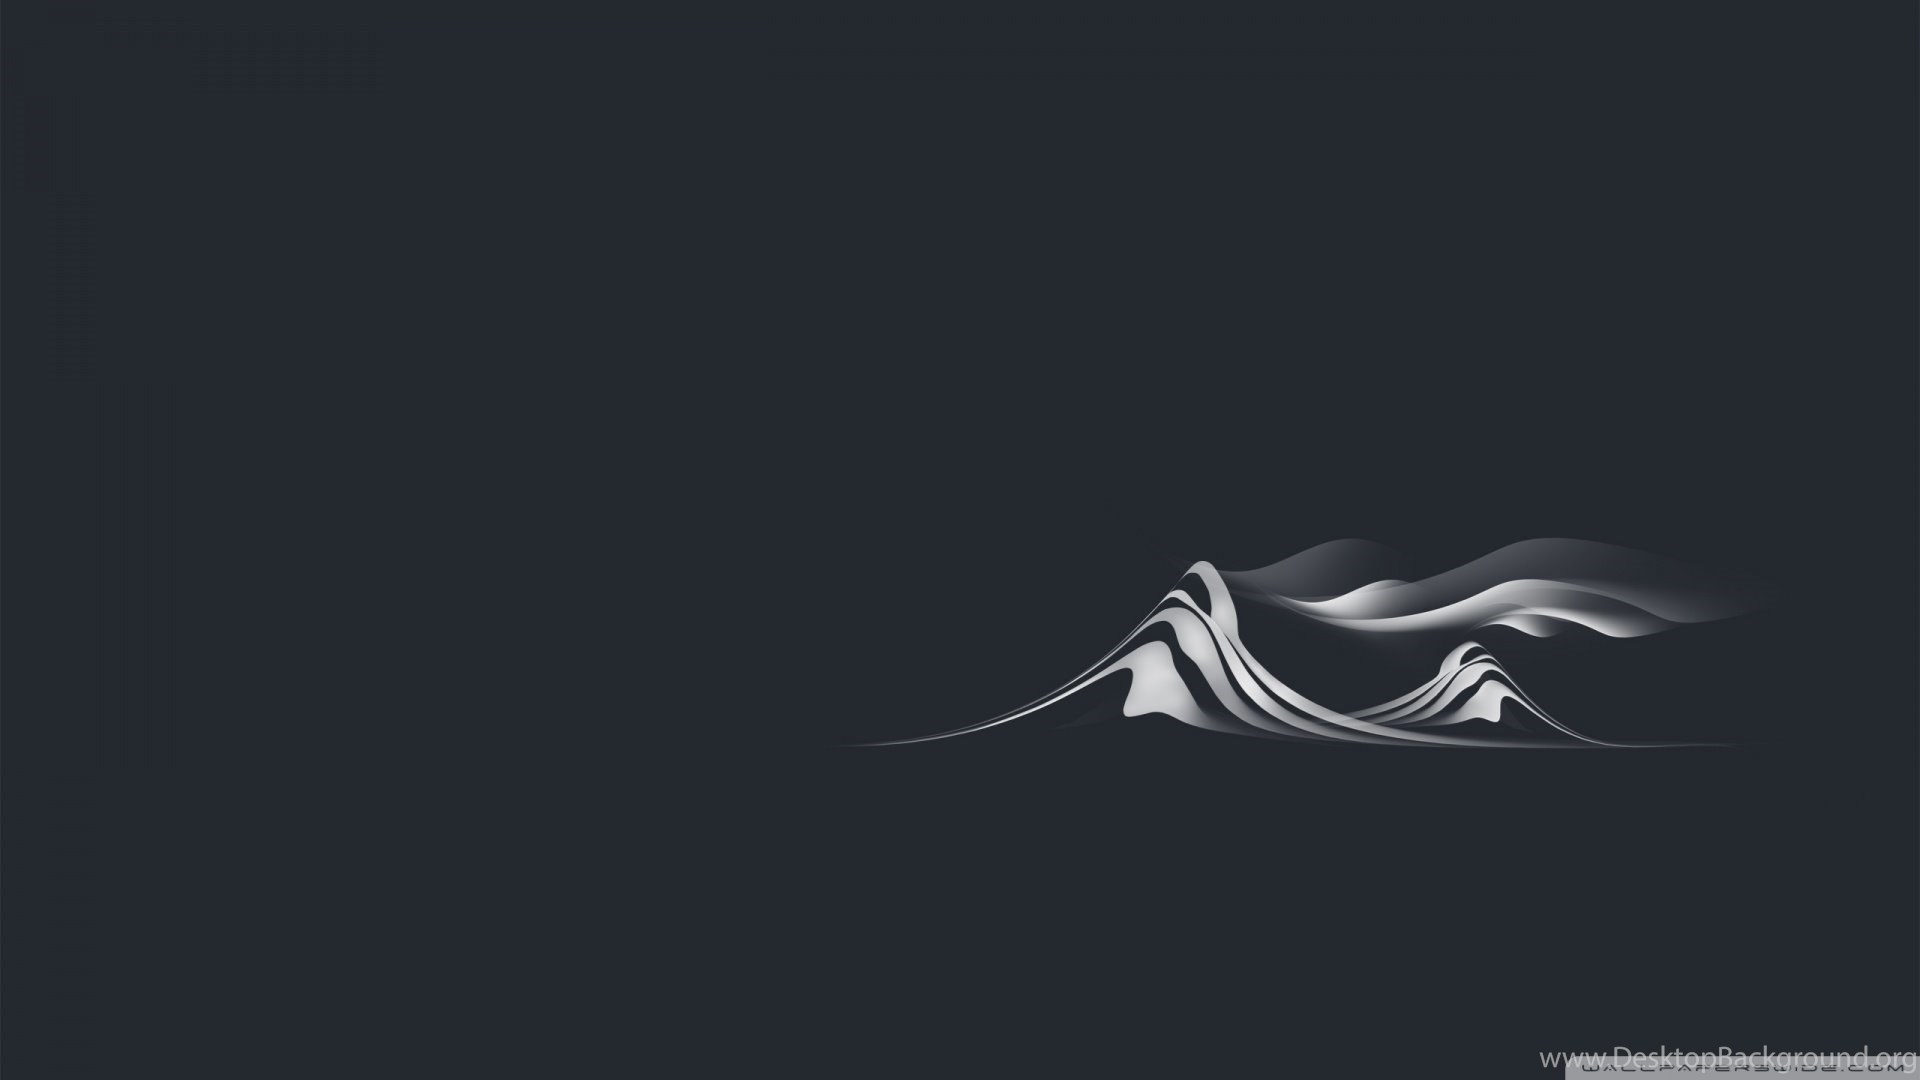 Minimalist Art Design Vi Hd Desktop Wallpapers High Definition Desktop Background